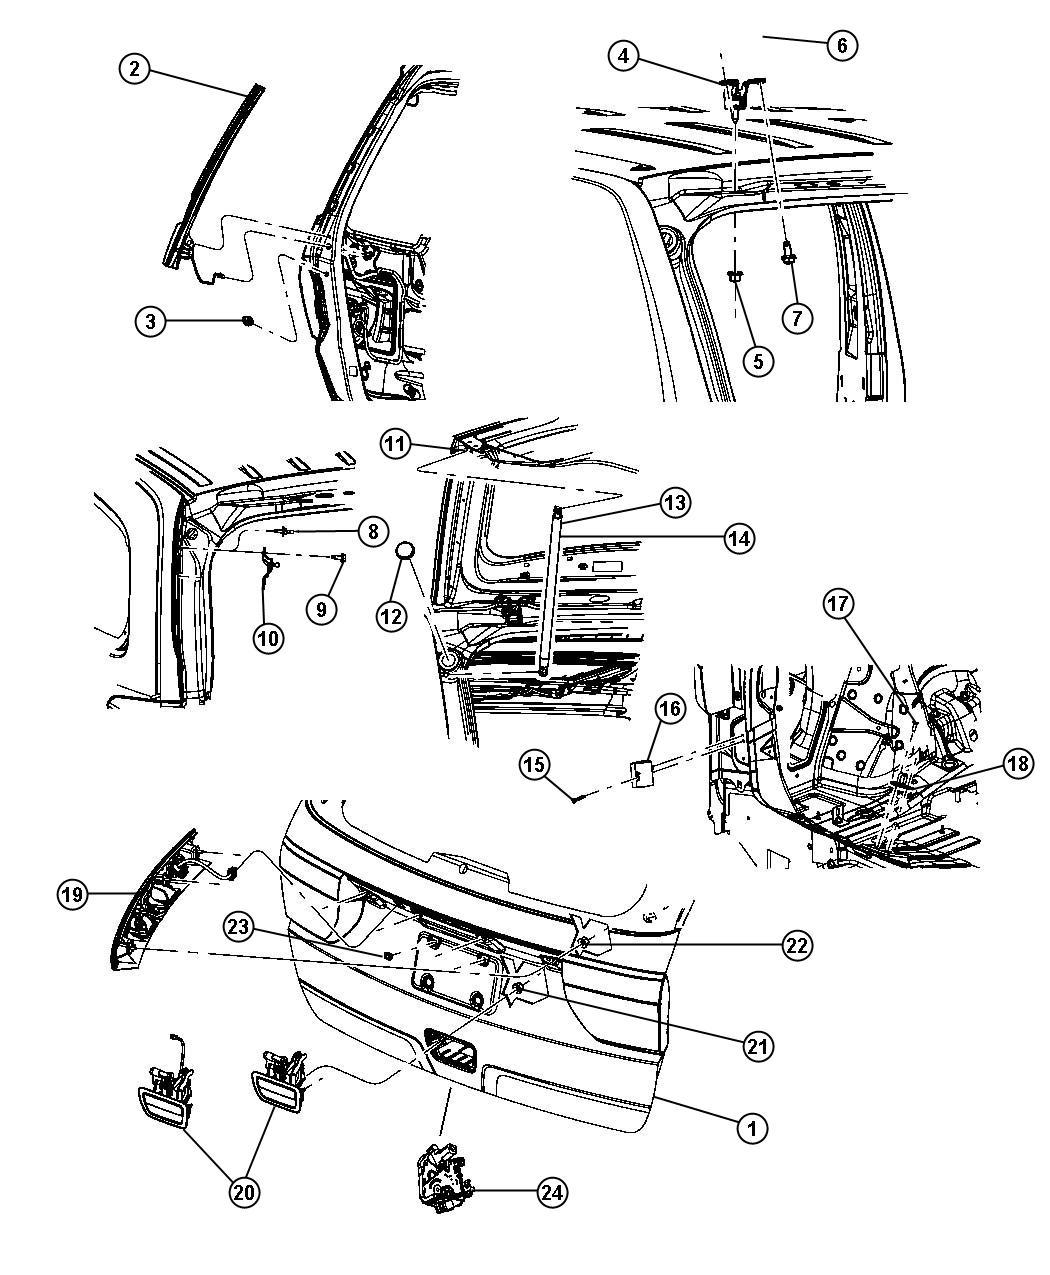 2011 Dodge Magnum Applique, handle. License lamp, liftgate